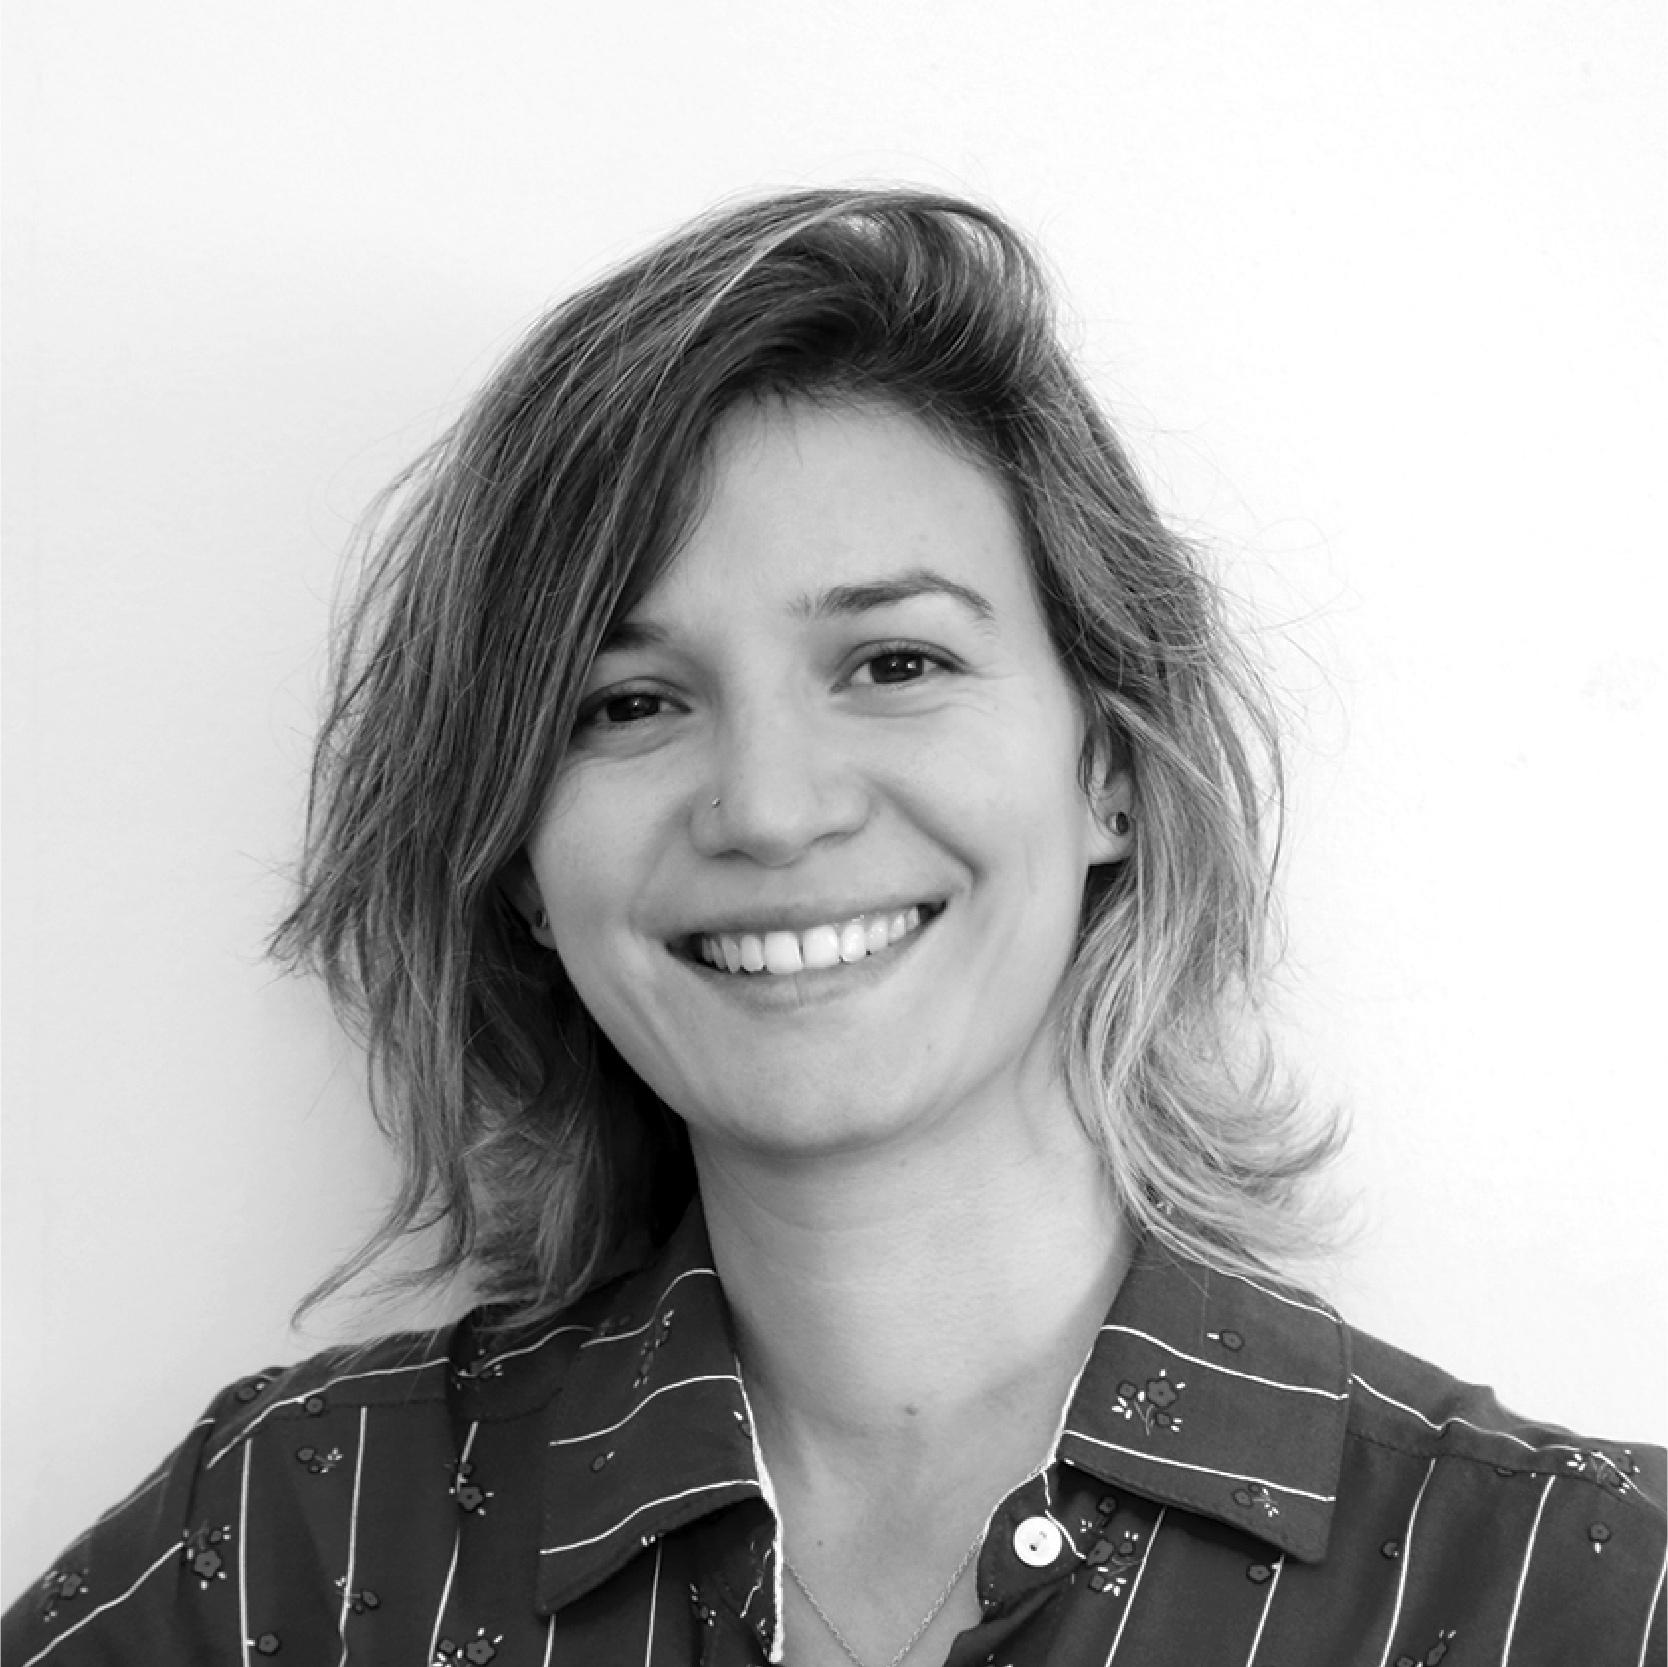 Carolina Rimoldi